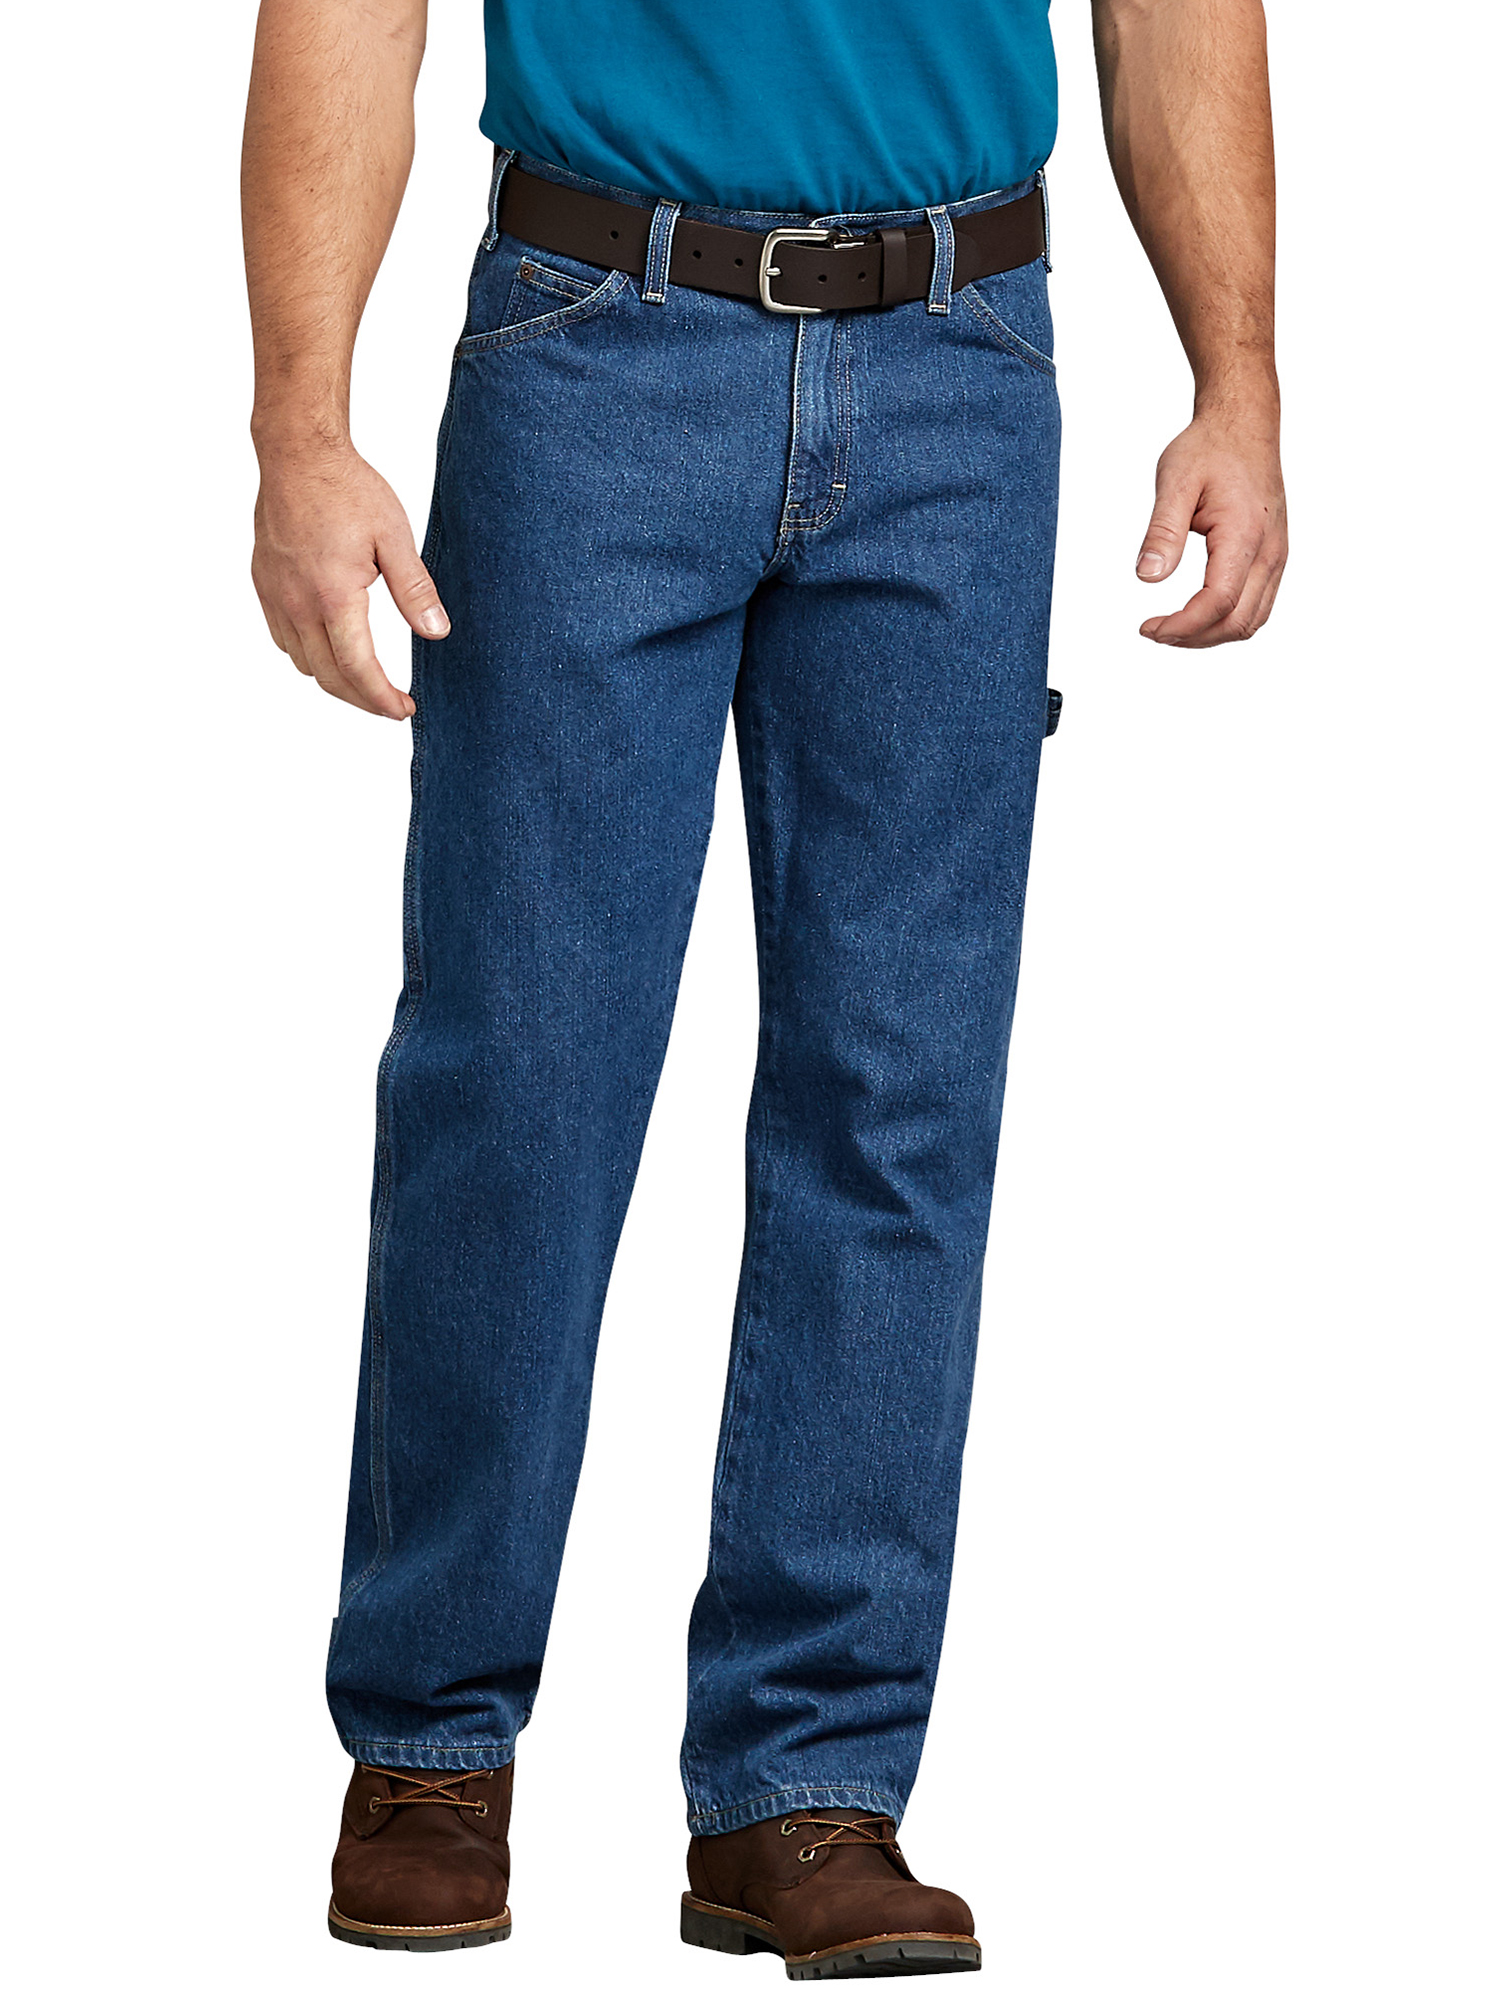 Dickies Men's 5-Pocket Professional Grade Utility Jeans